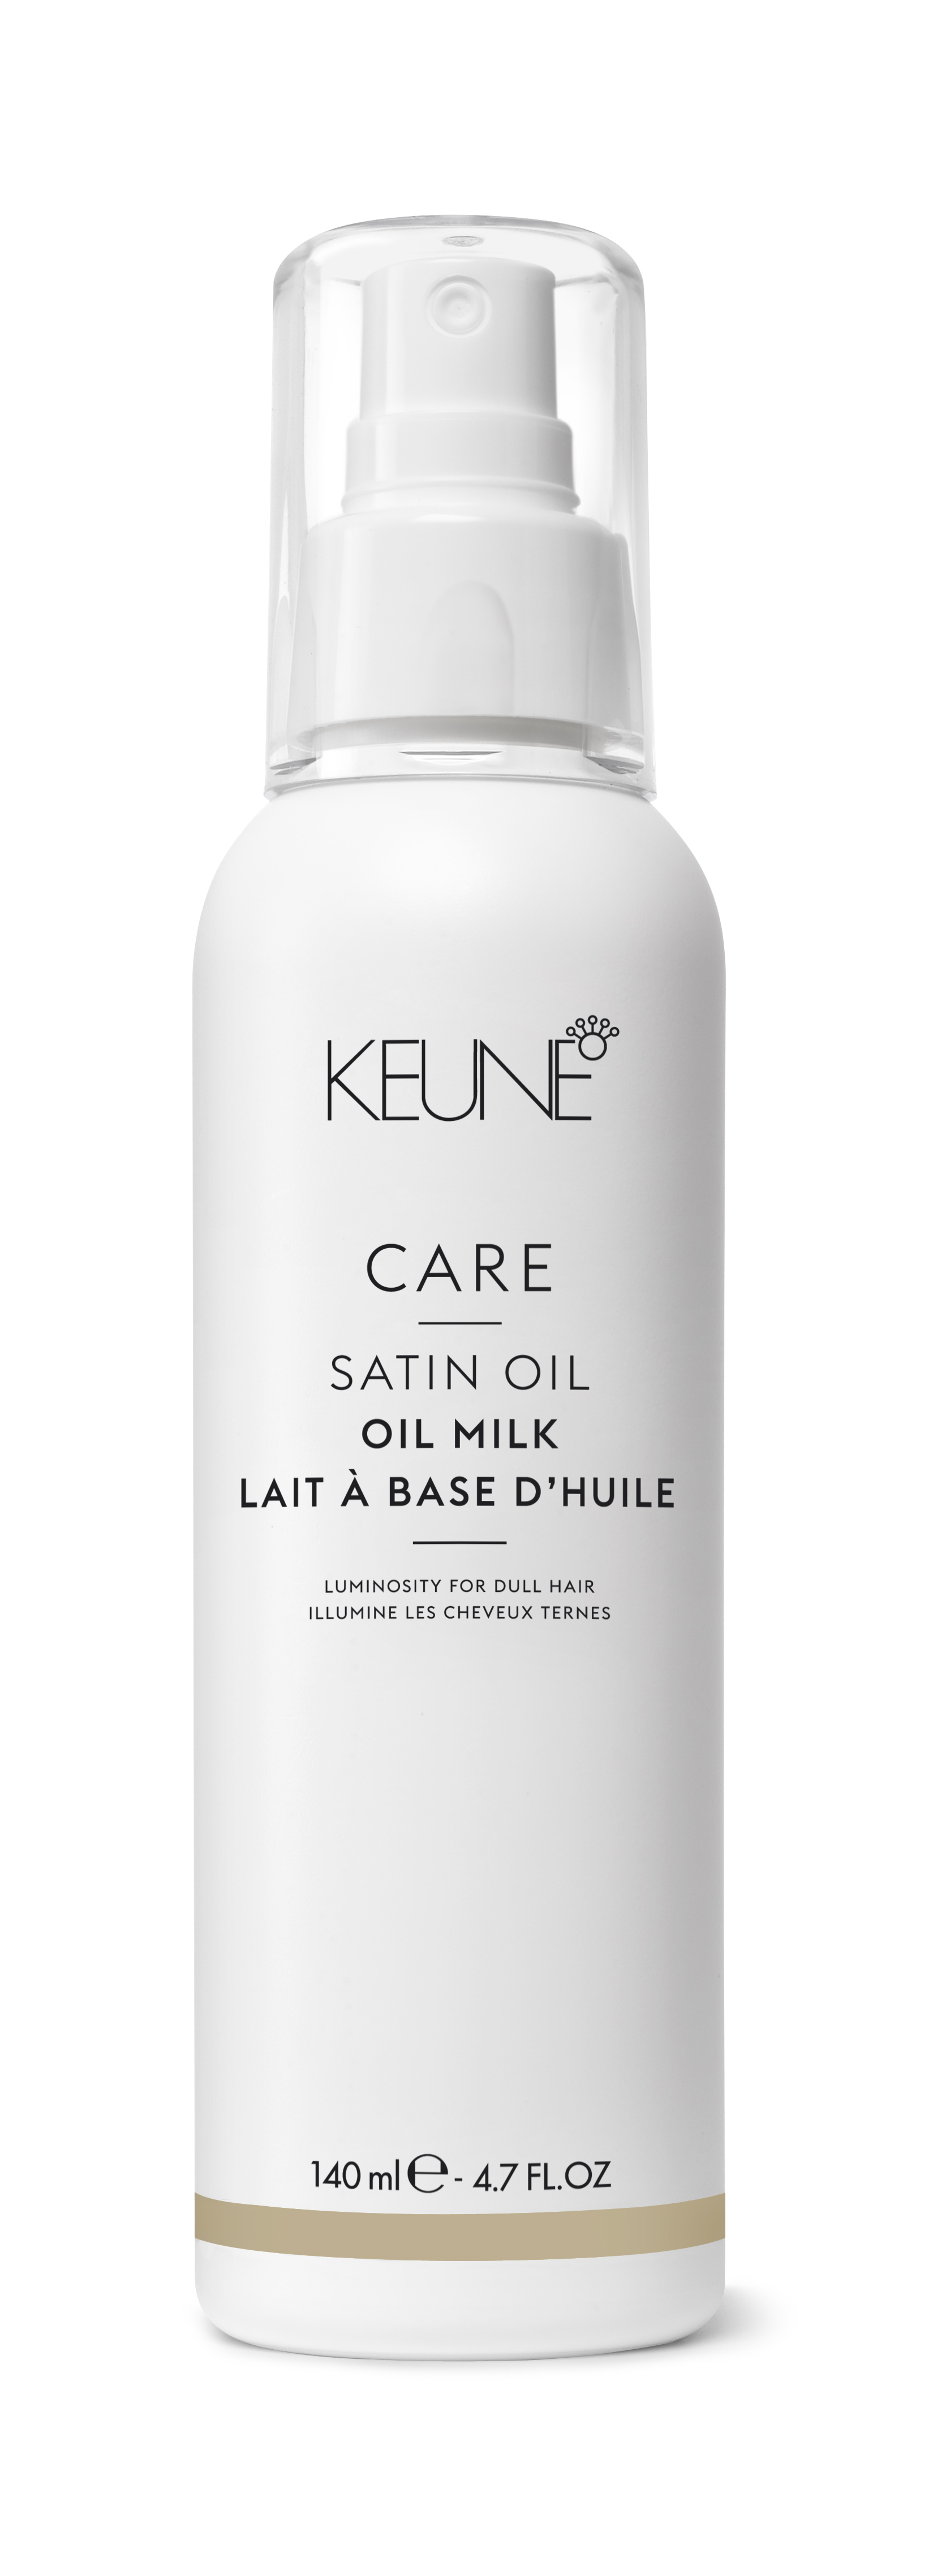 KEUNE Масло-молочко для волос & Шелковый уход&  / CARE Satin Oil  Oil Milk 140мл -  Молочко